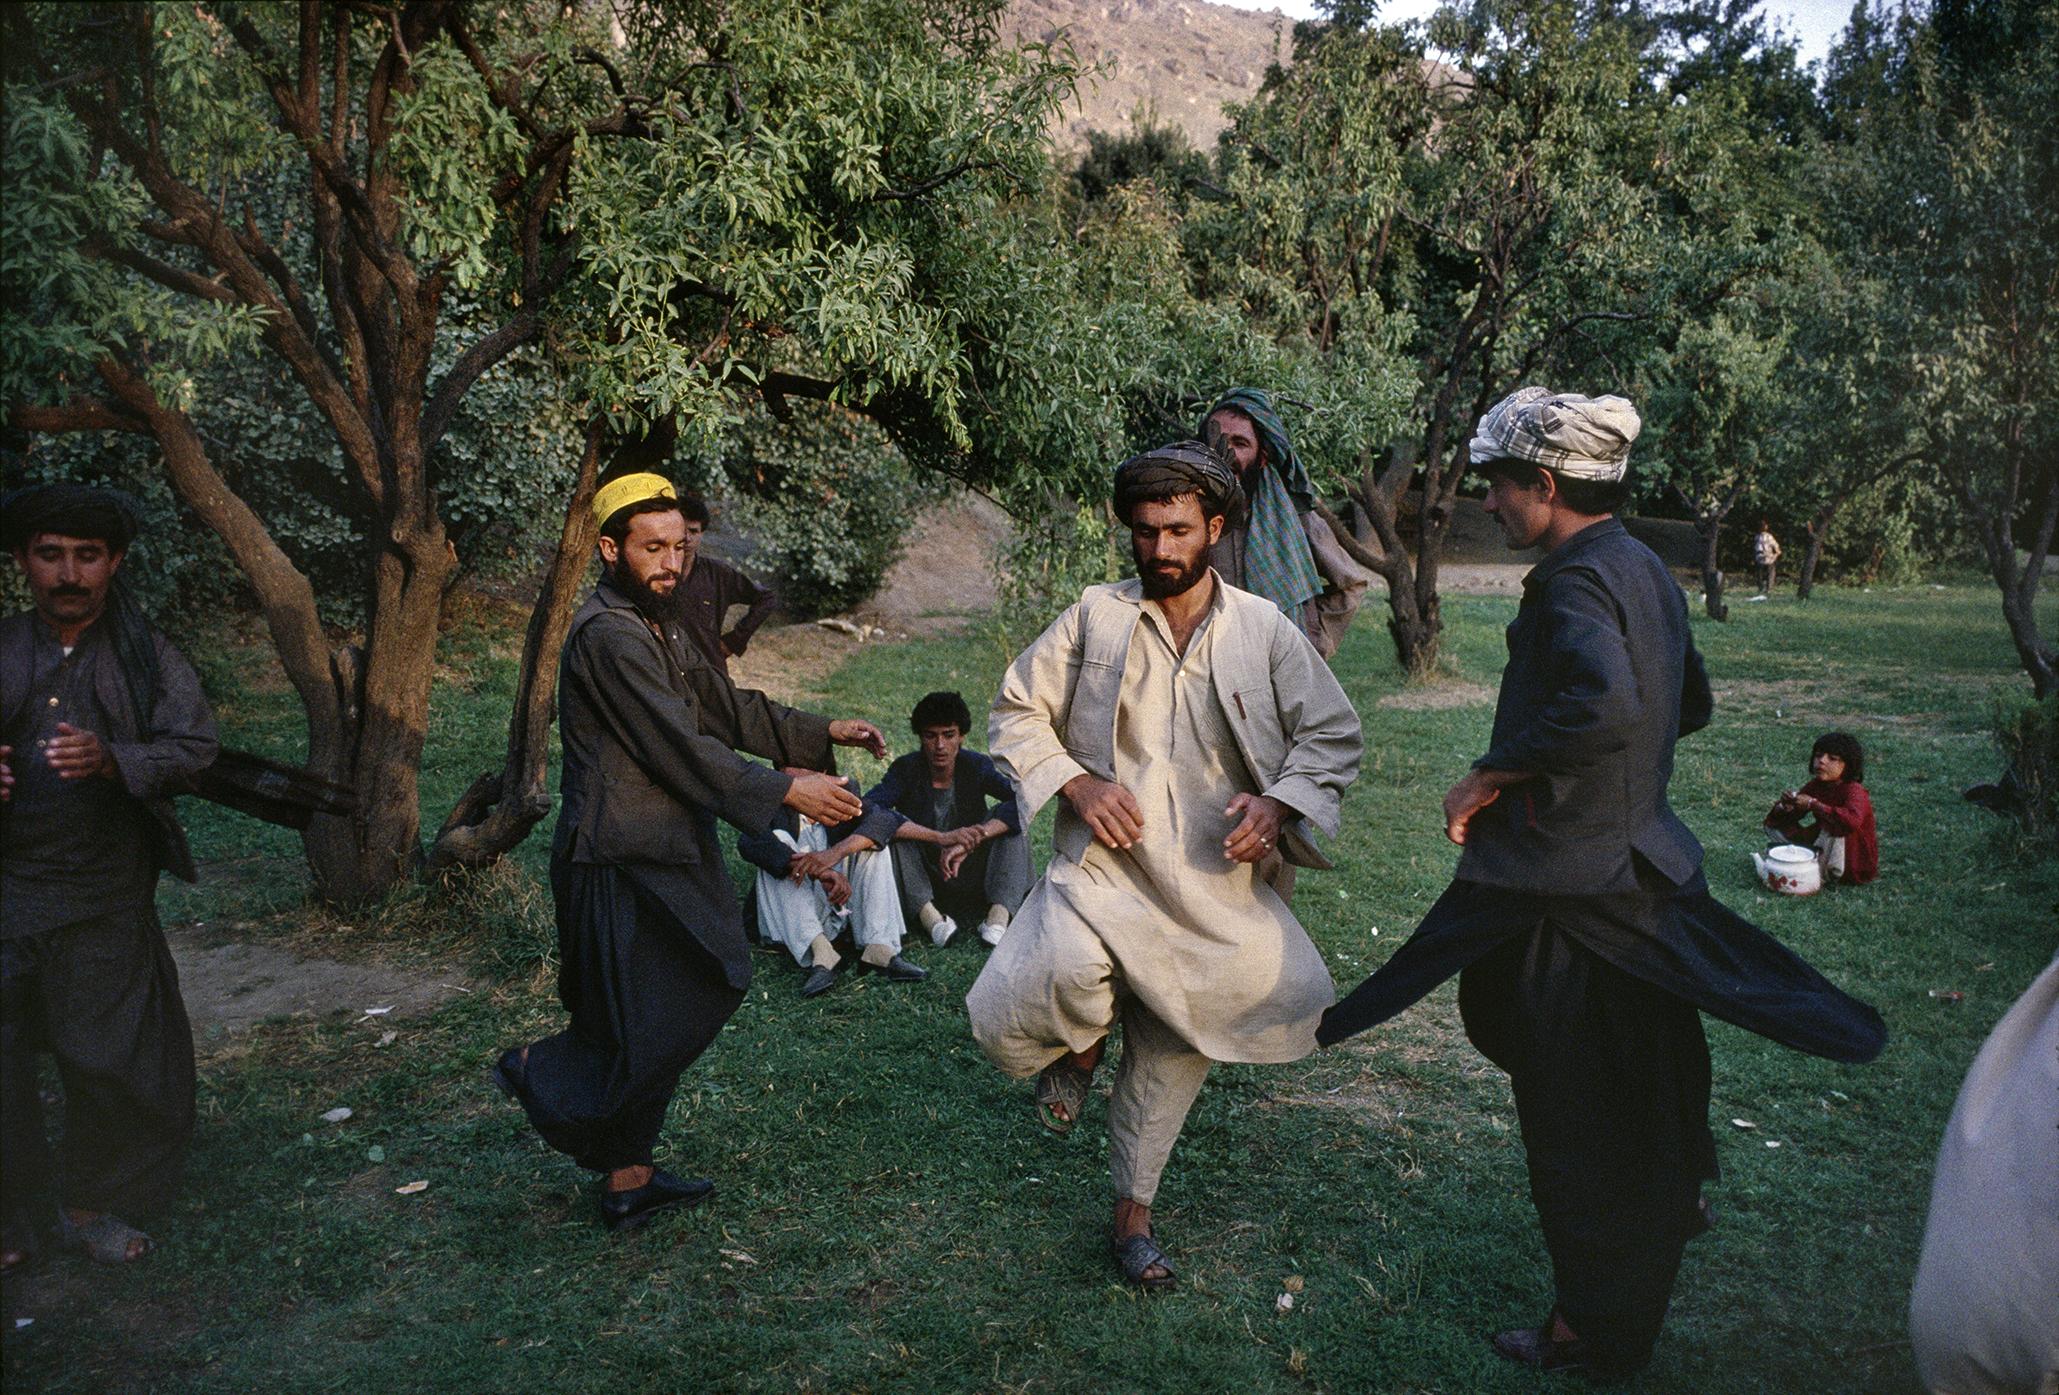 September 1991: Afghans in the Bagh-e Babur, or Babur's Garden, perform the attan, a traditional Afghan folk dance.